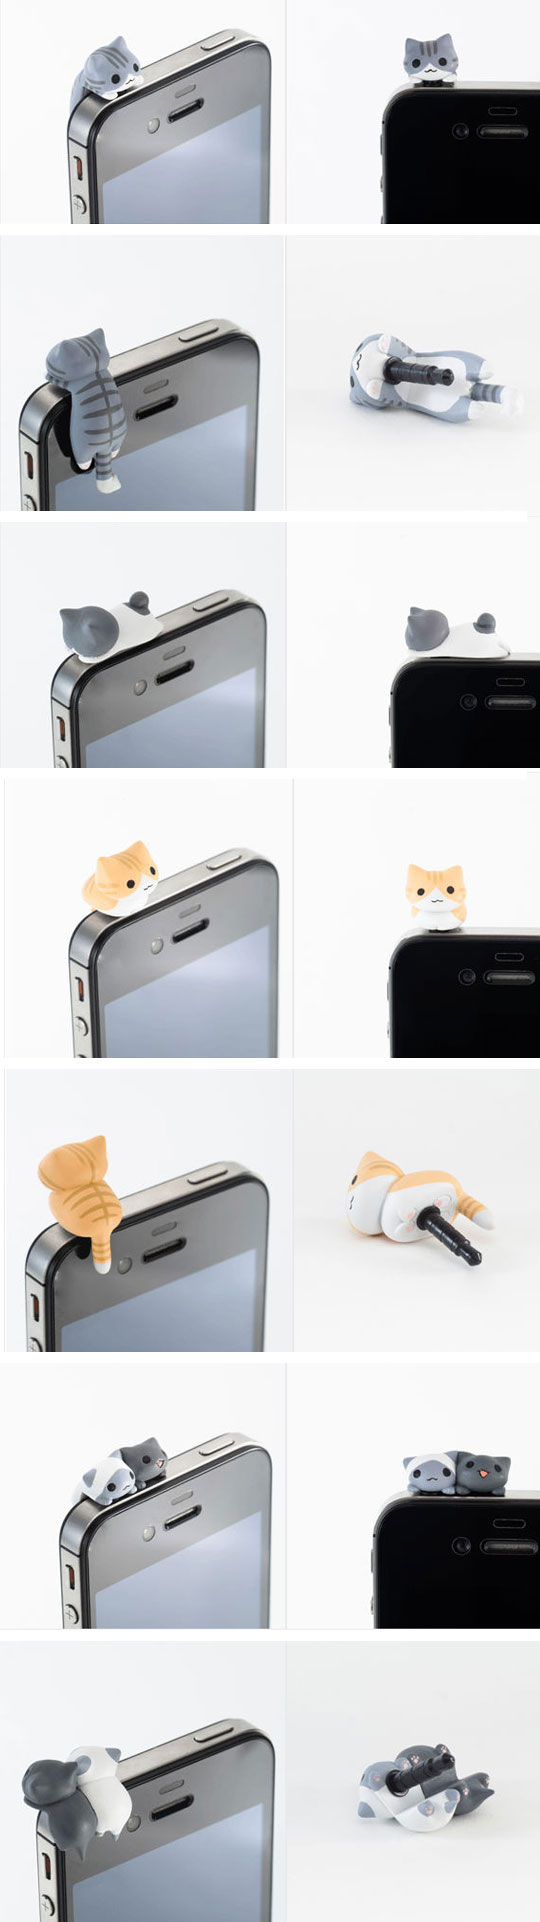 The iCat